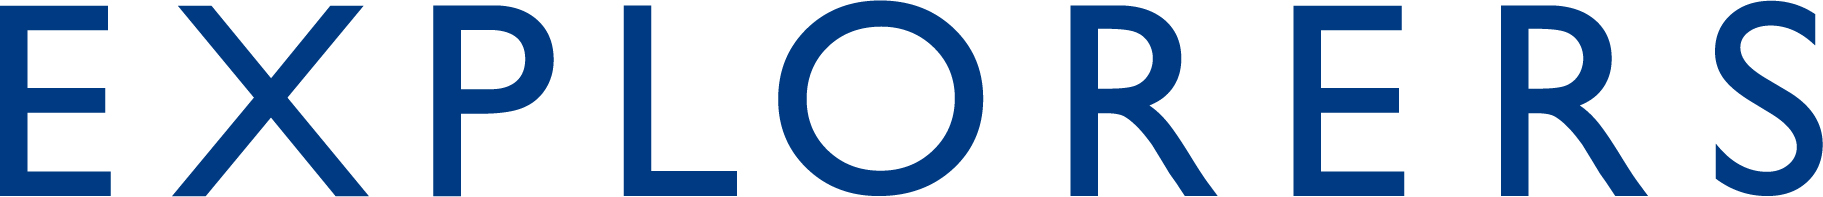 explorers logo